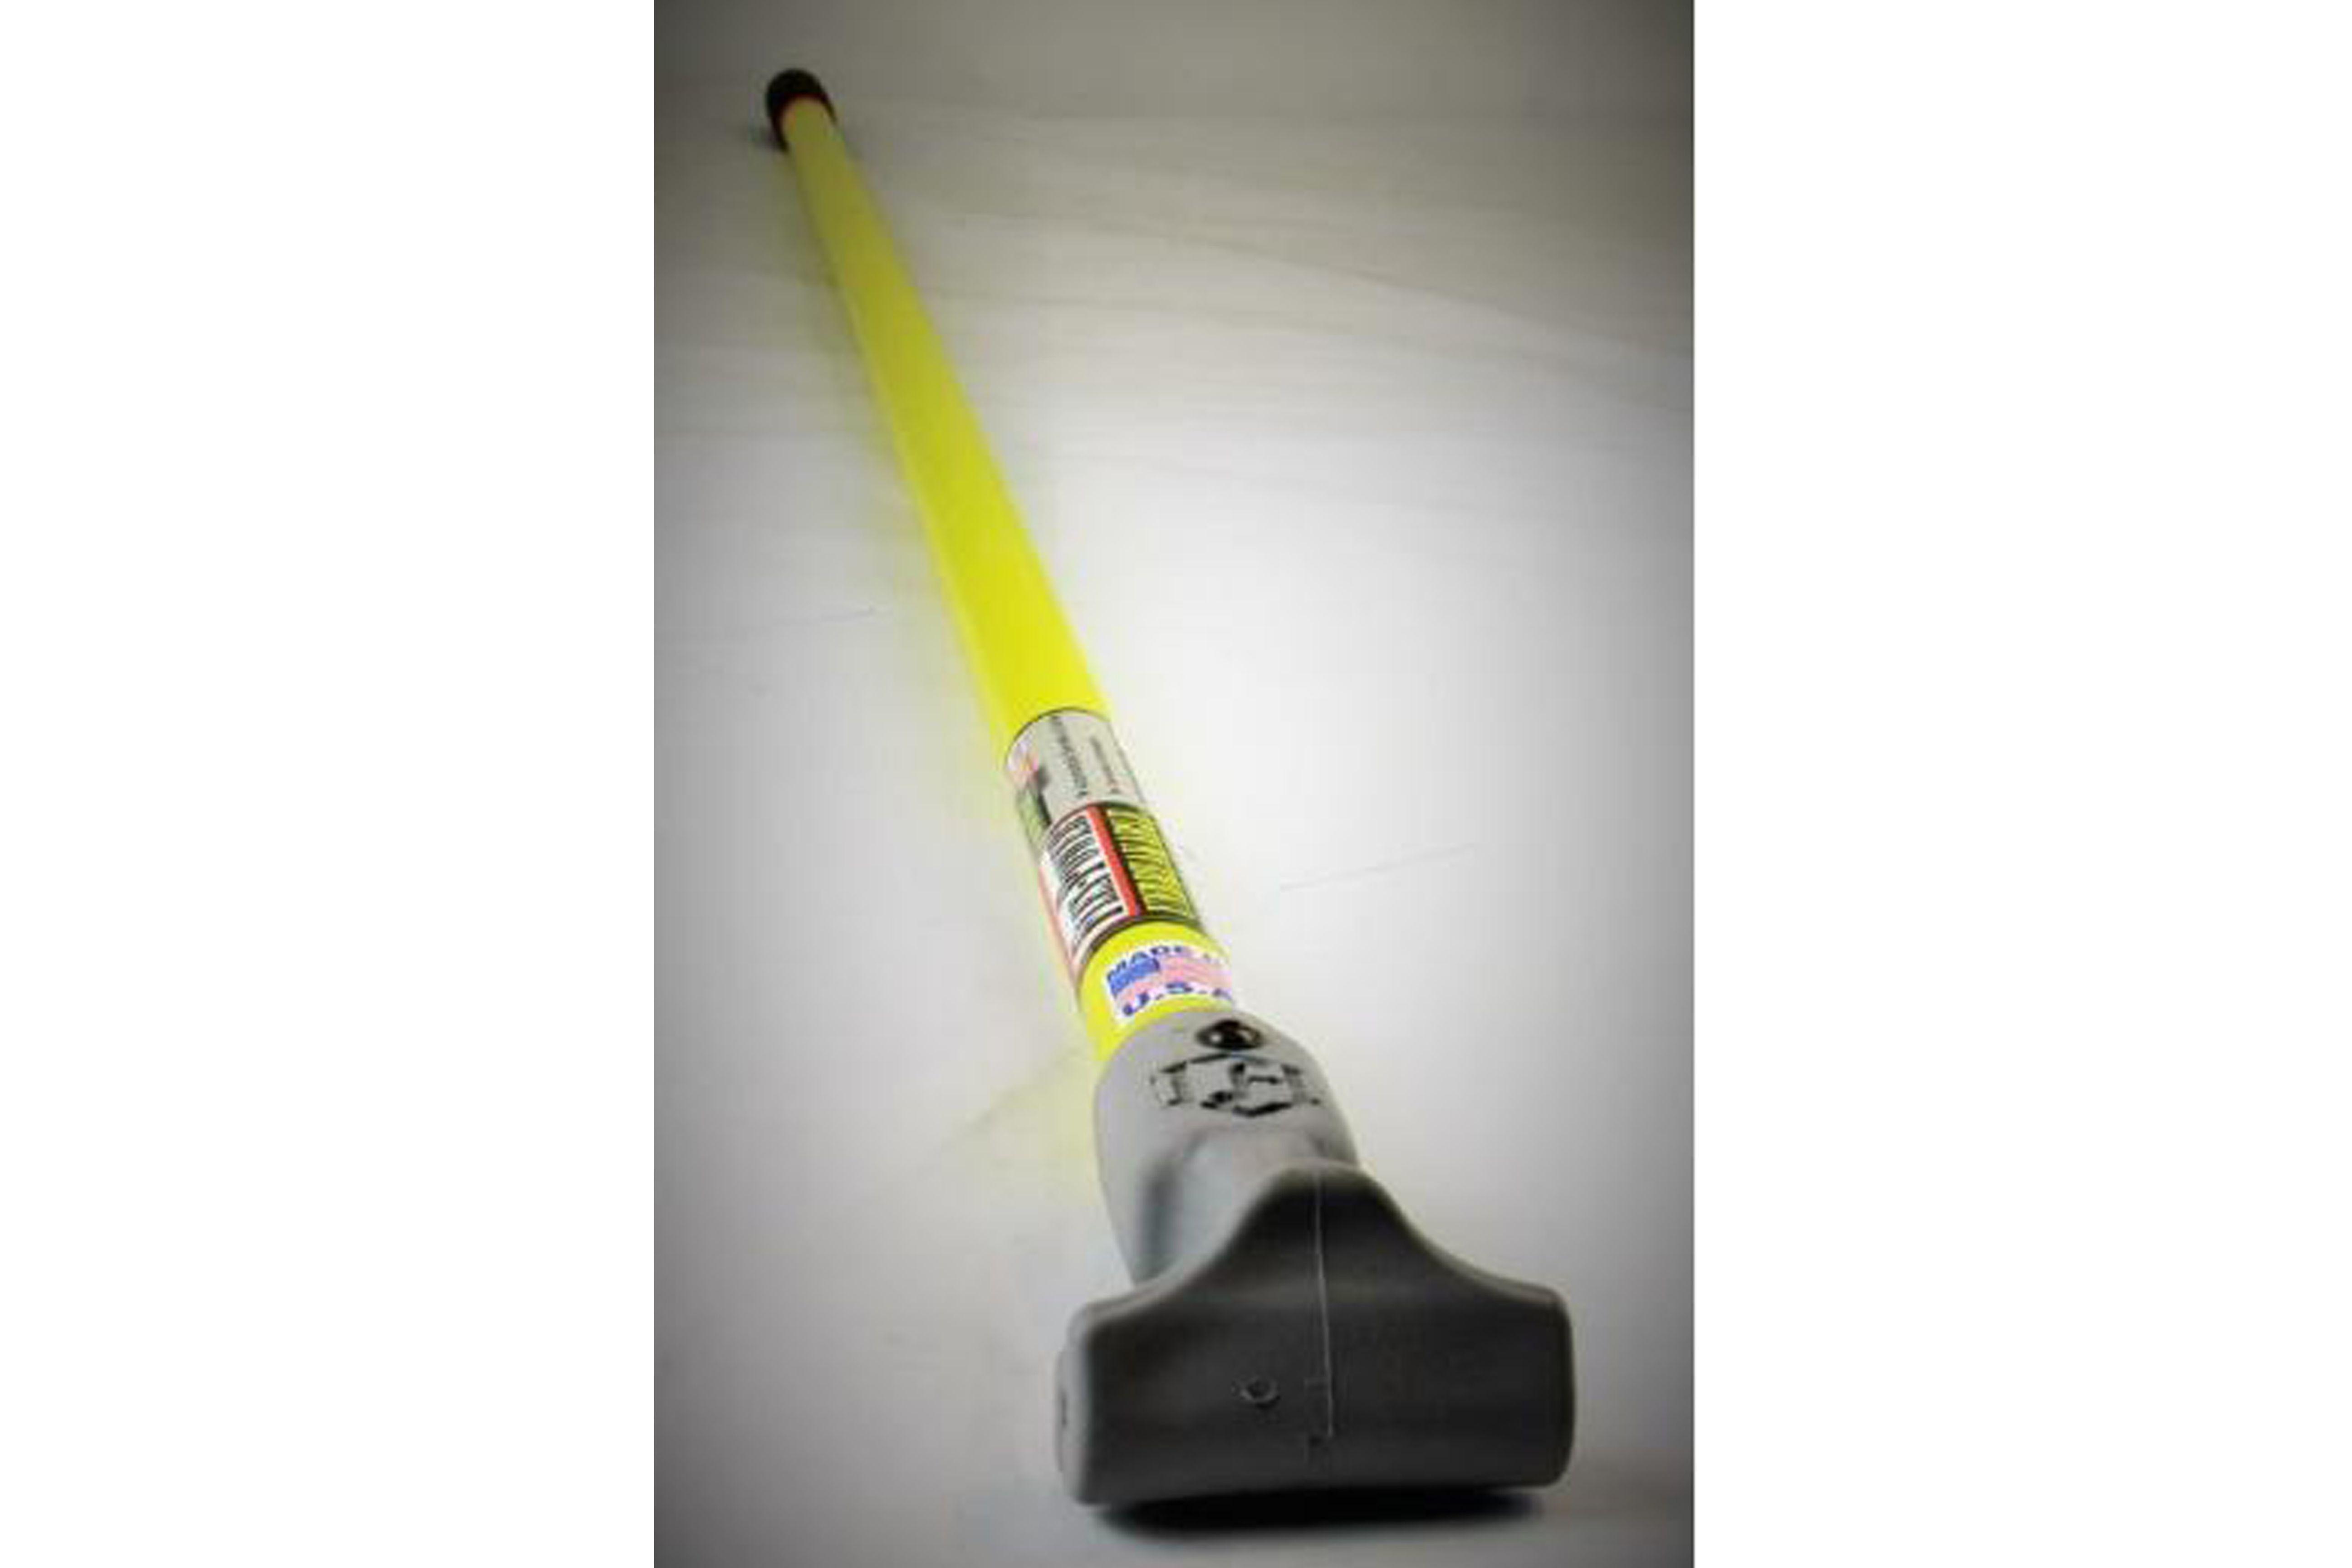 Tg8 Fiberglass Dust Mop Handle For Dust Mops 6 Pack Handle Mop Heads Packing